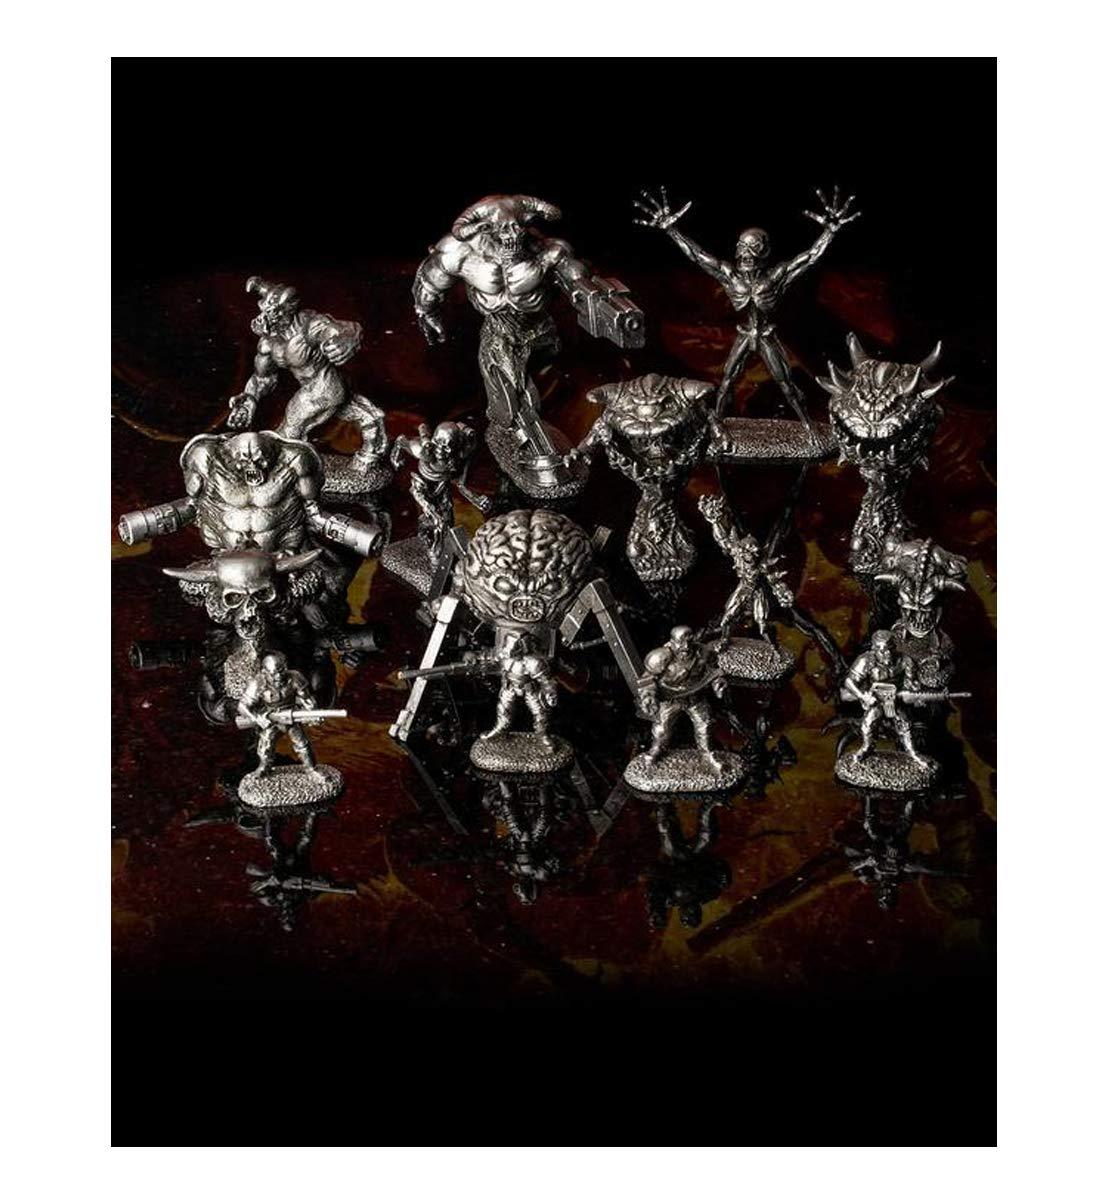 Doom Reaper Miniature Pewter Figure Set with Doom Box, Hand Polished - 15 Piece Set